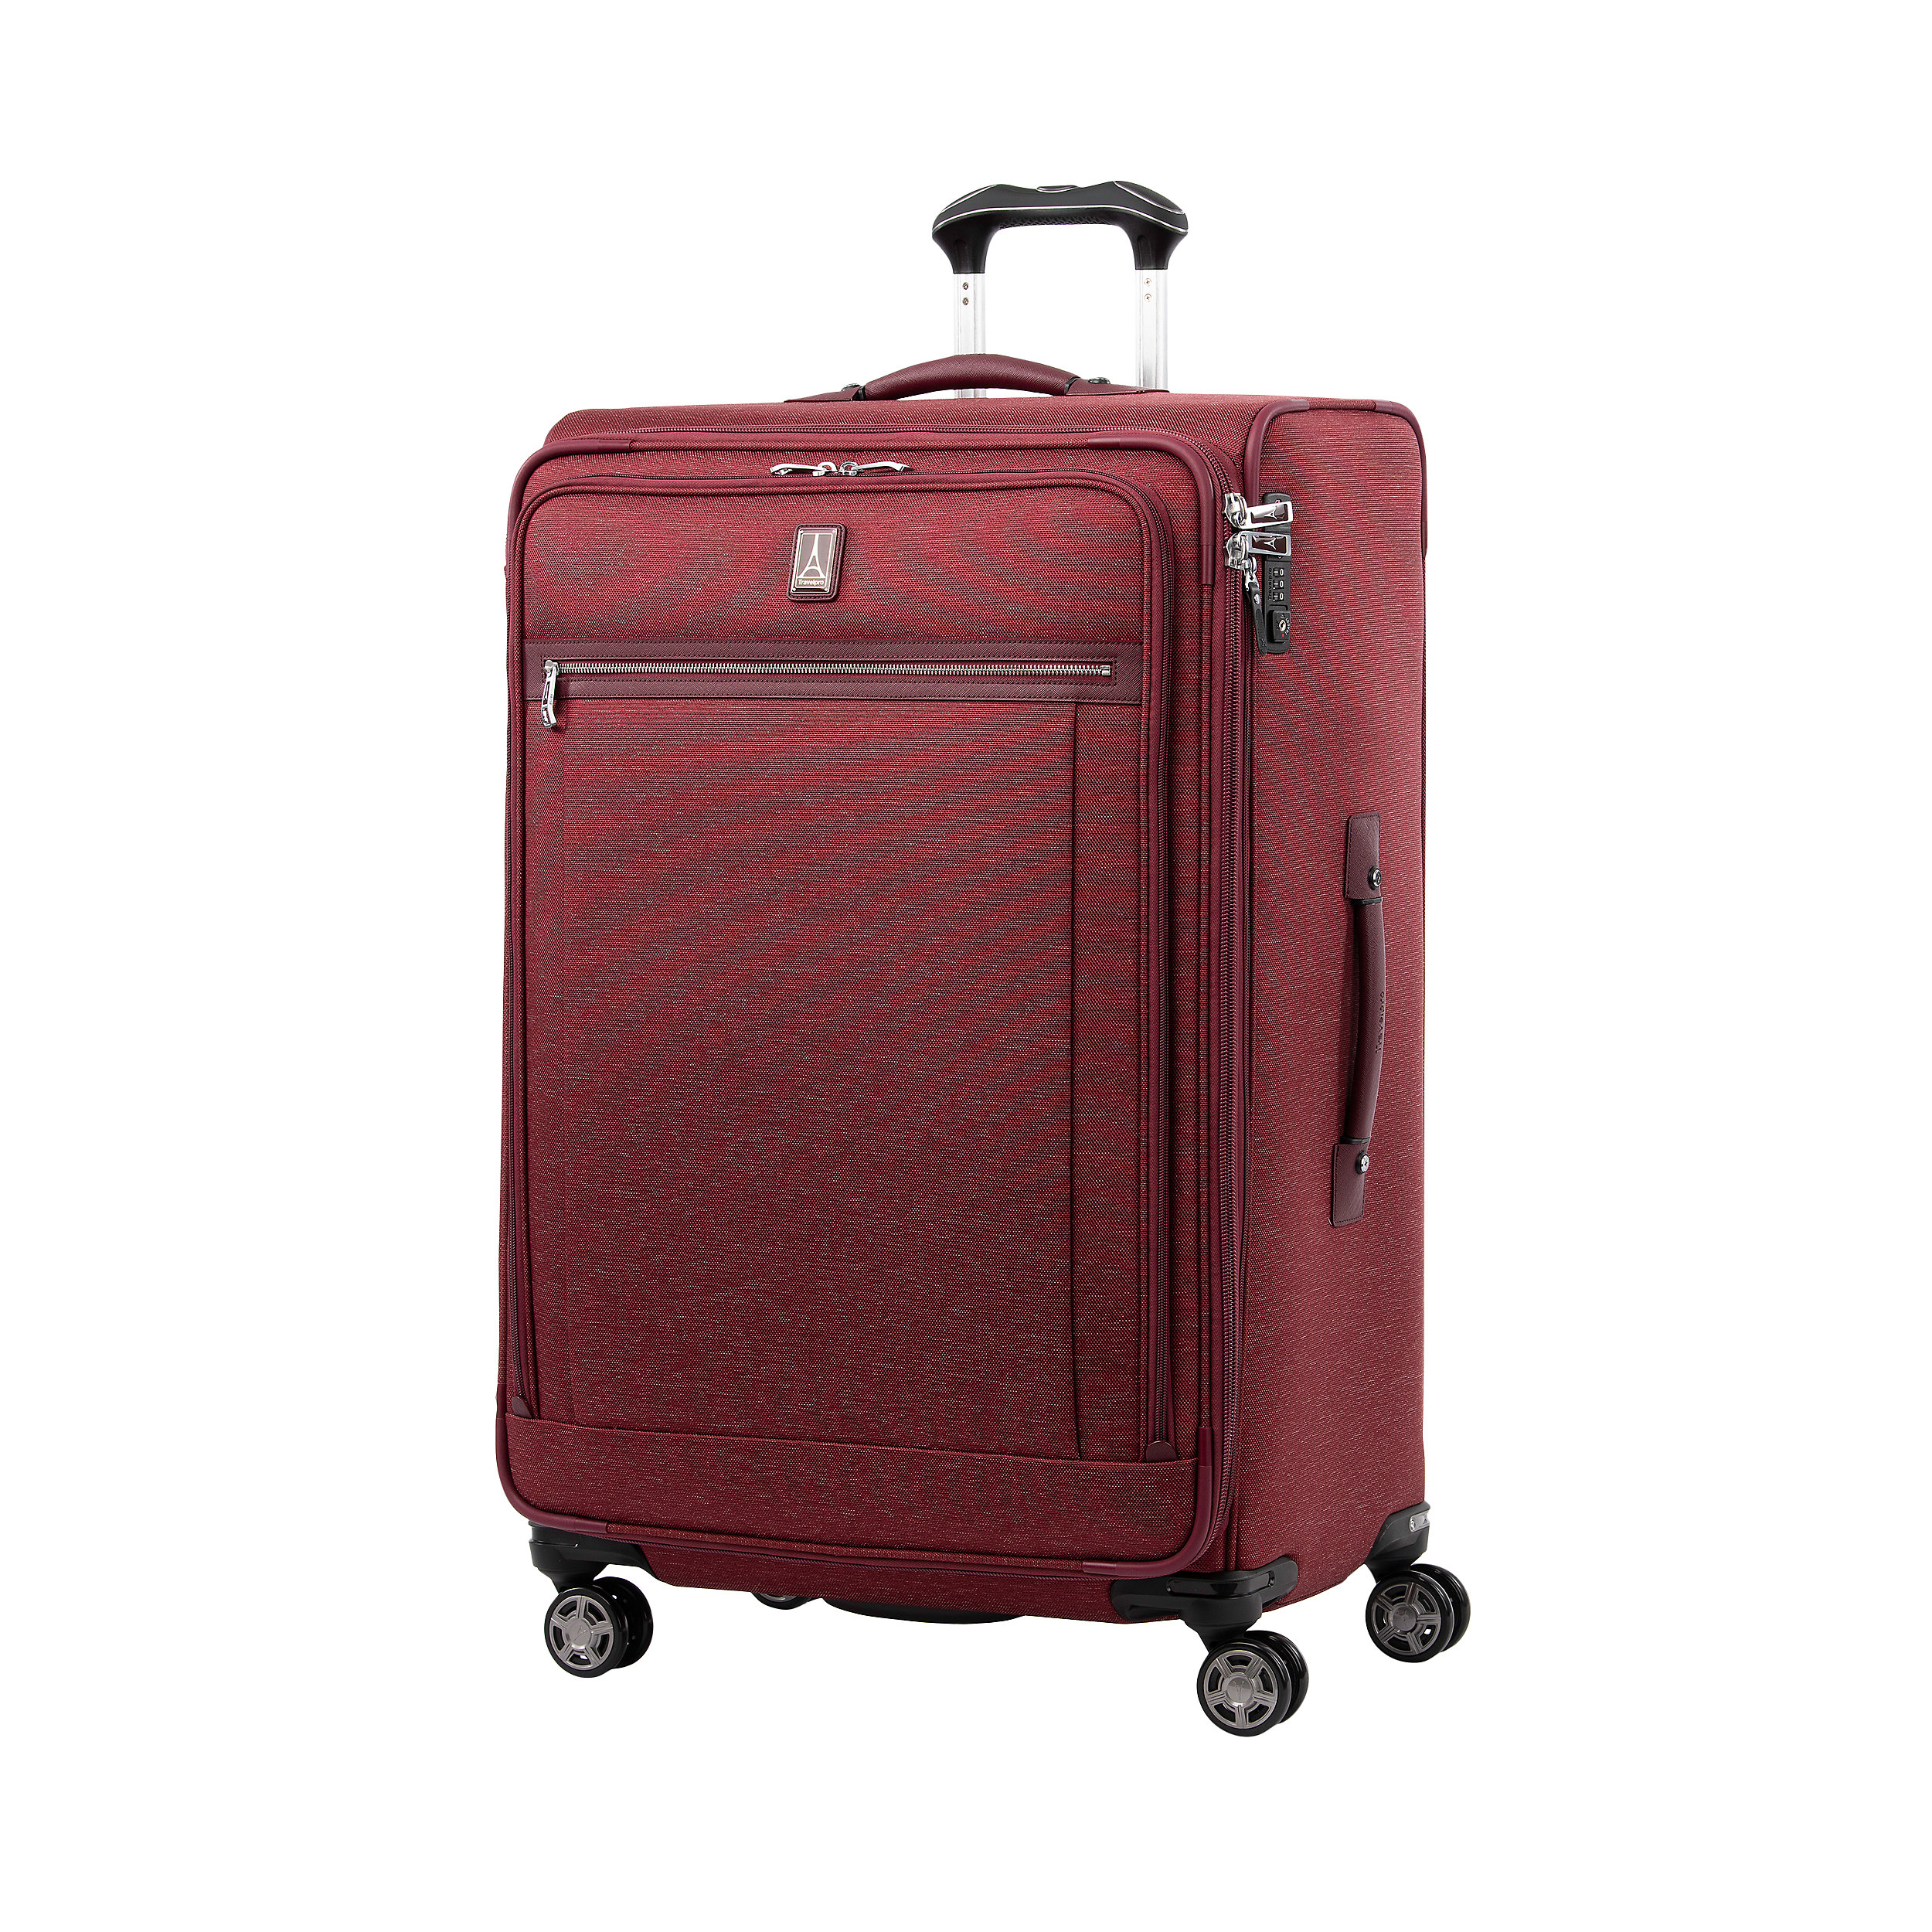 Suitcase with 4 wheels 83 cm Expandable Platinum Elite Extra Large 144 Liter